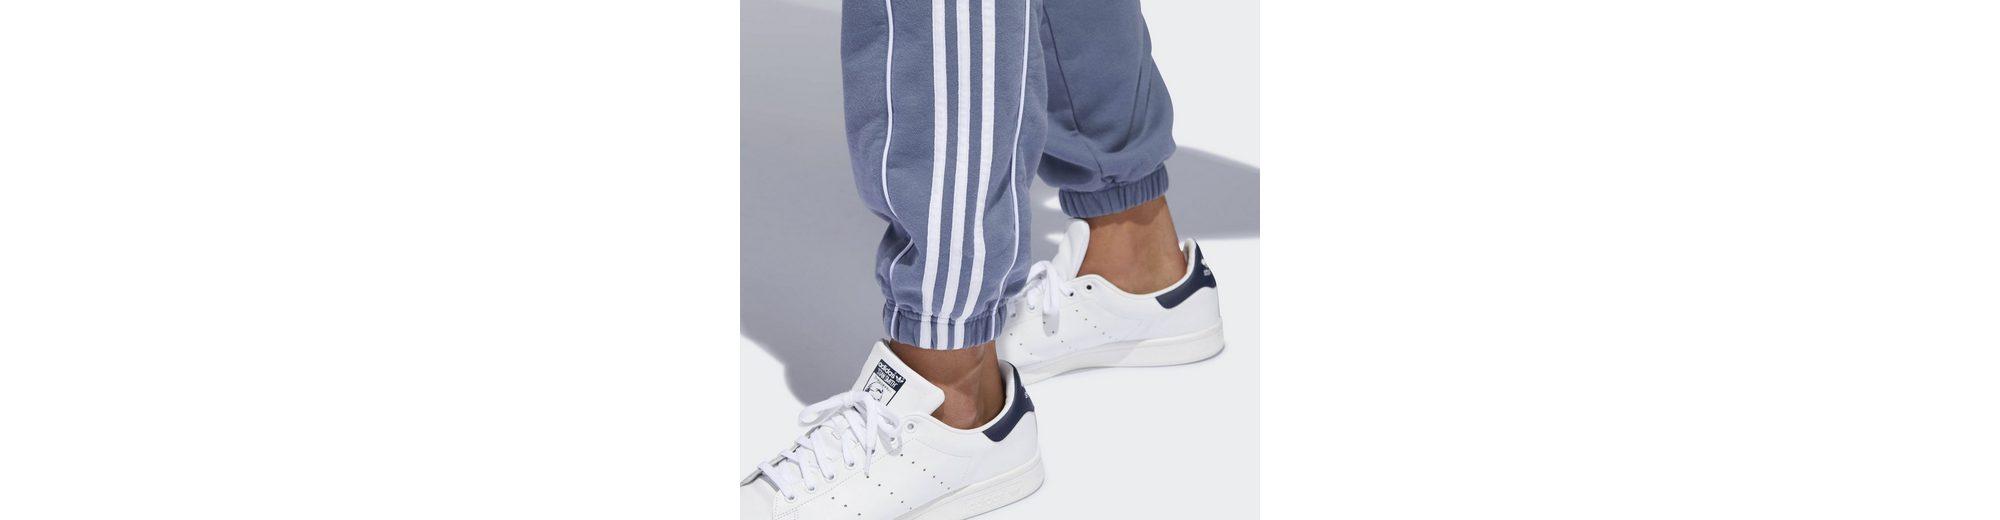 adidas Originals Trainingshose Pipe Jogginghose Auslass Erhalten Zu Kaufen jTkVAi